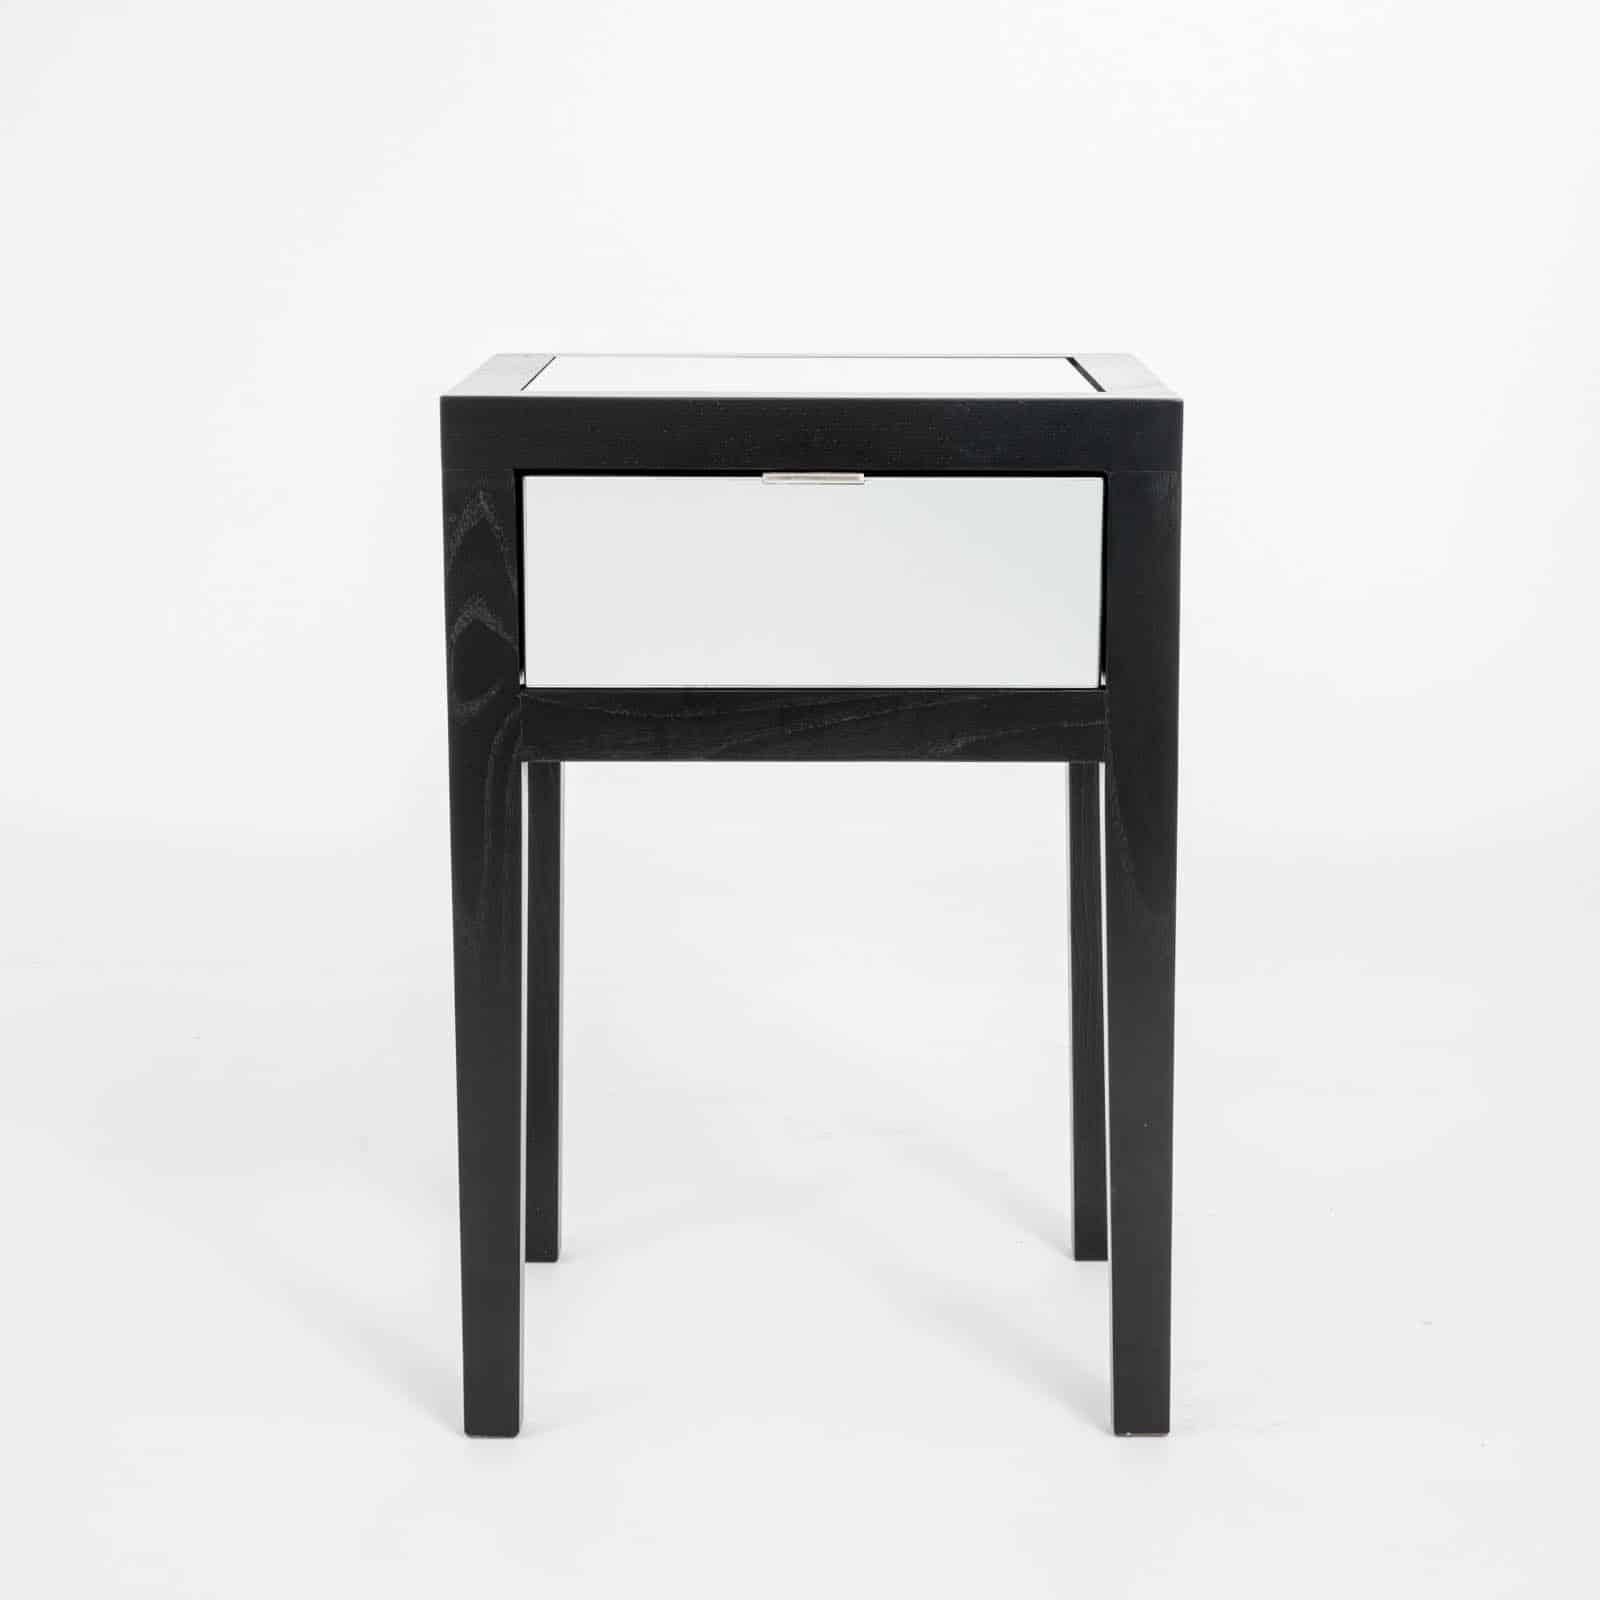 Josephine bedside 1 drawer black di designs for 1 drawer bedside table